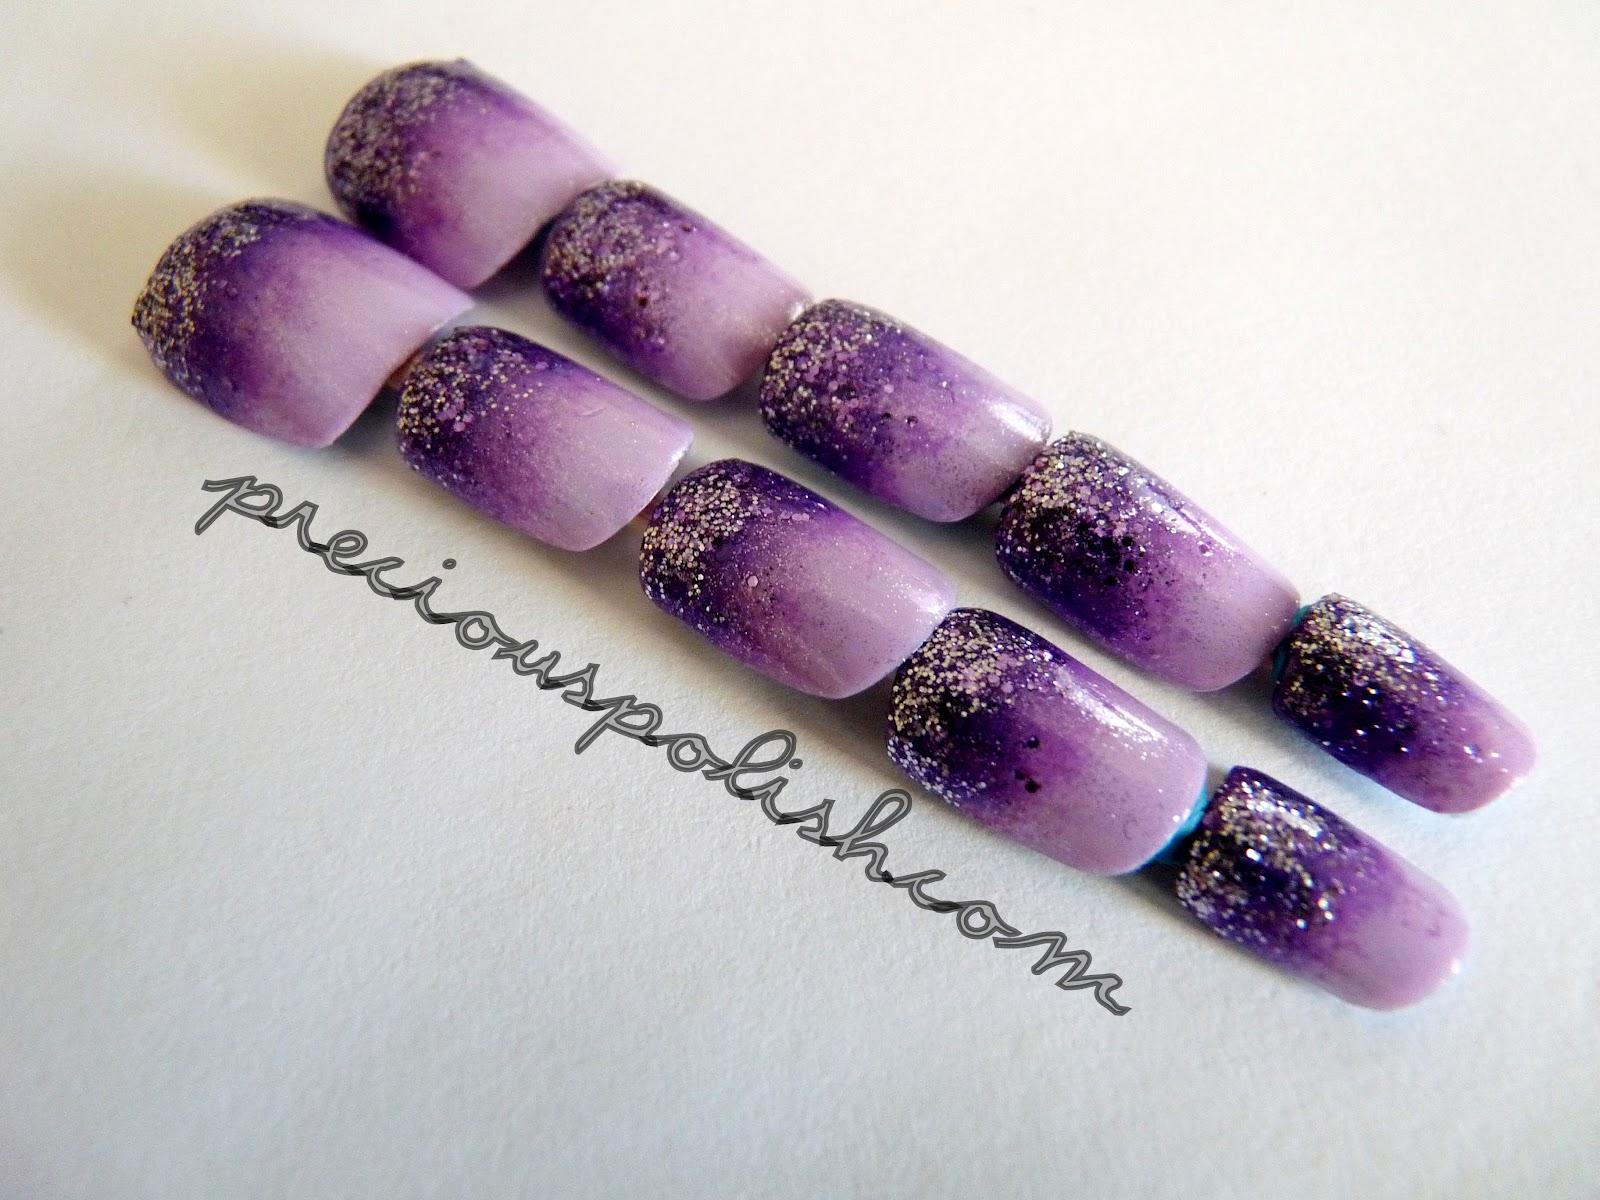 Precious Polish Prom Perfect 8 Nail Designs